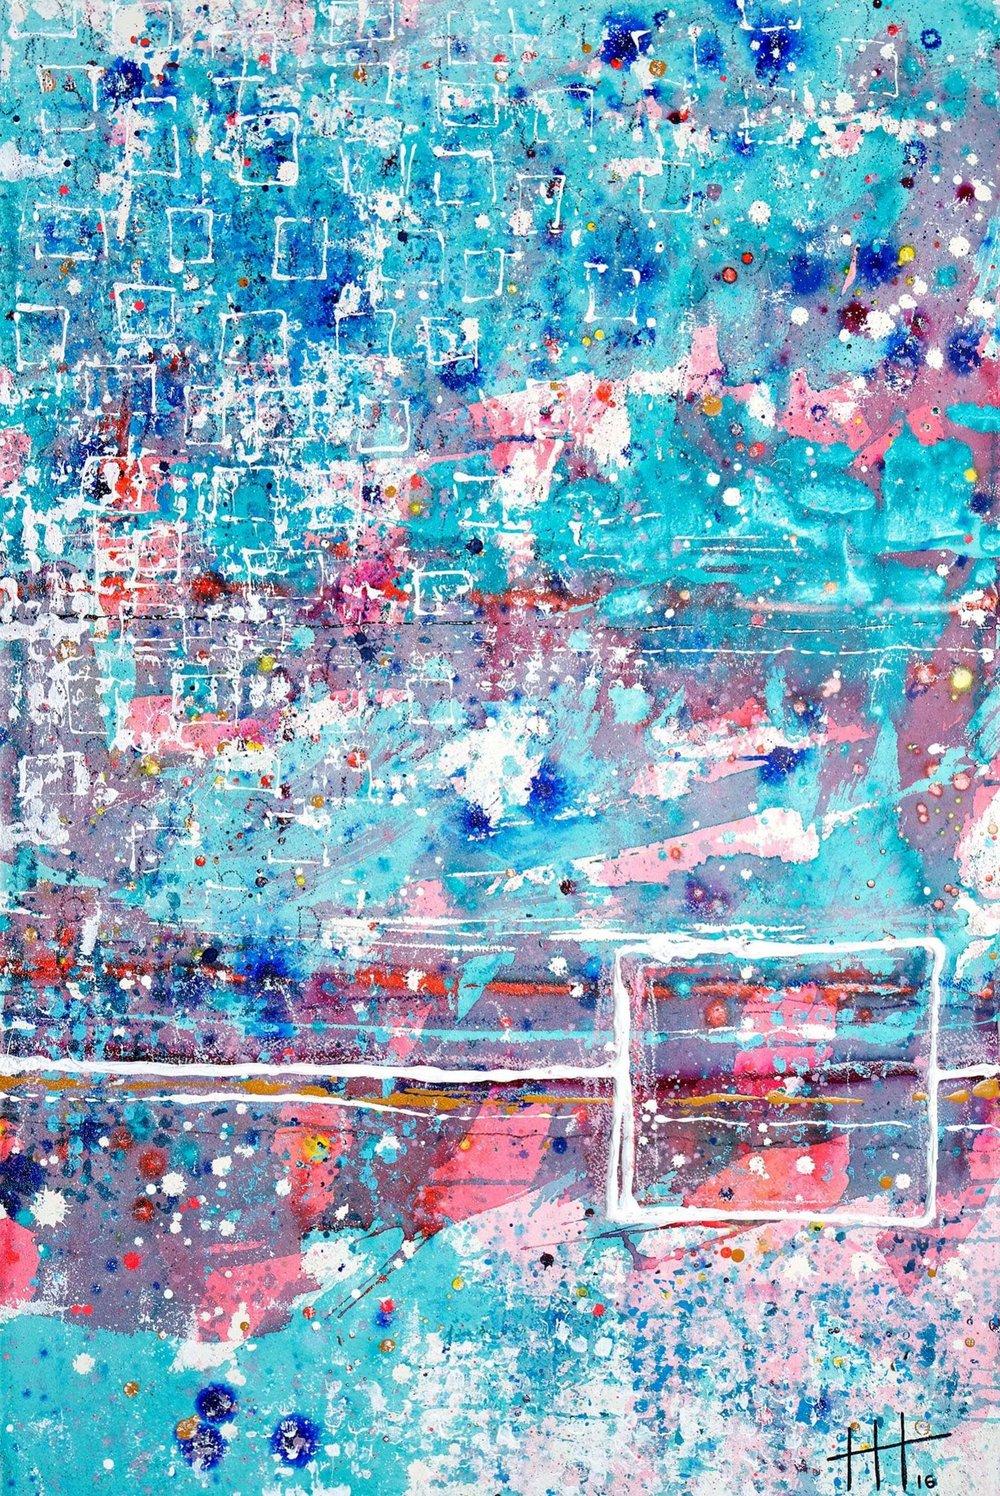 'The Glasshouse' Acrylic & Mixed Media /129cm x 93cm (framed) £1,750